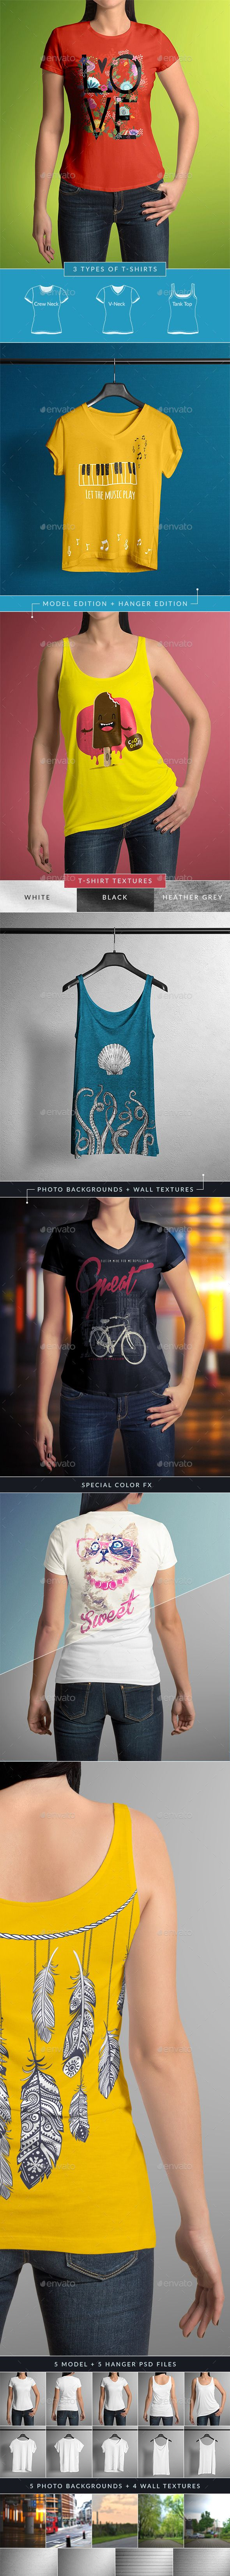 Download T Shirt Mock Up Female Model Classic Edition Clothing Mockup Shirt Mockup Tshirt Mockup